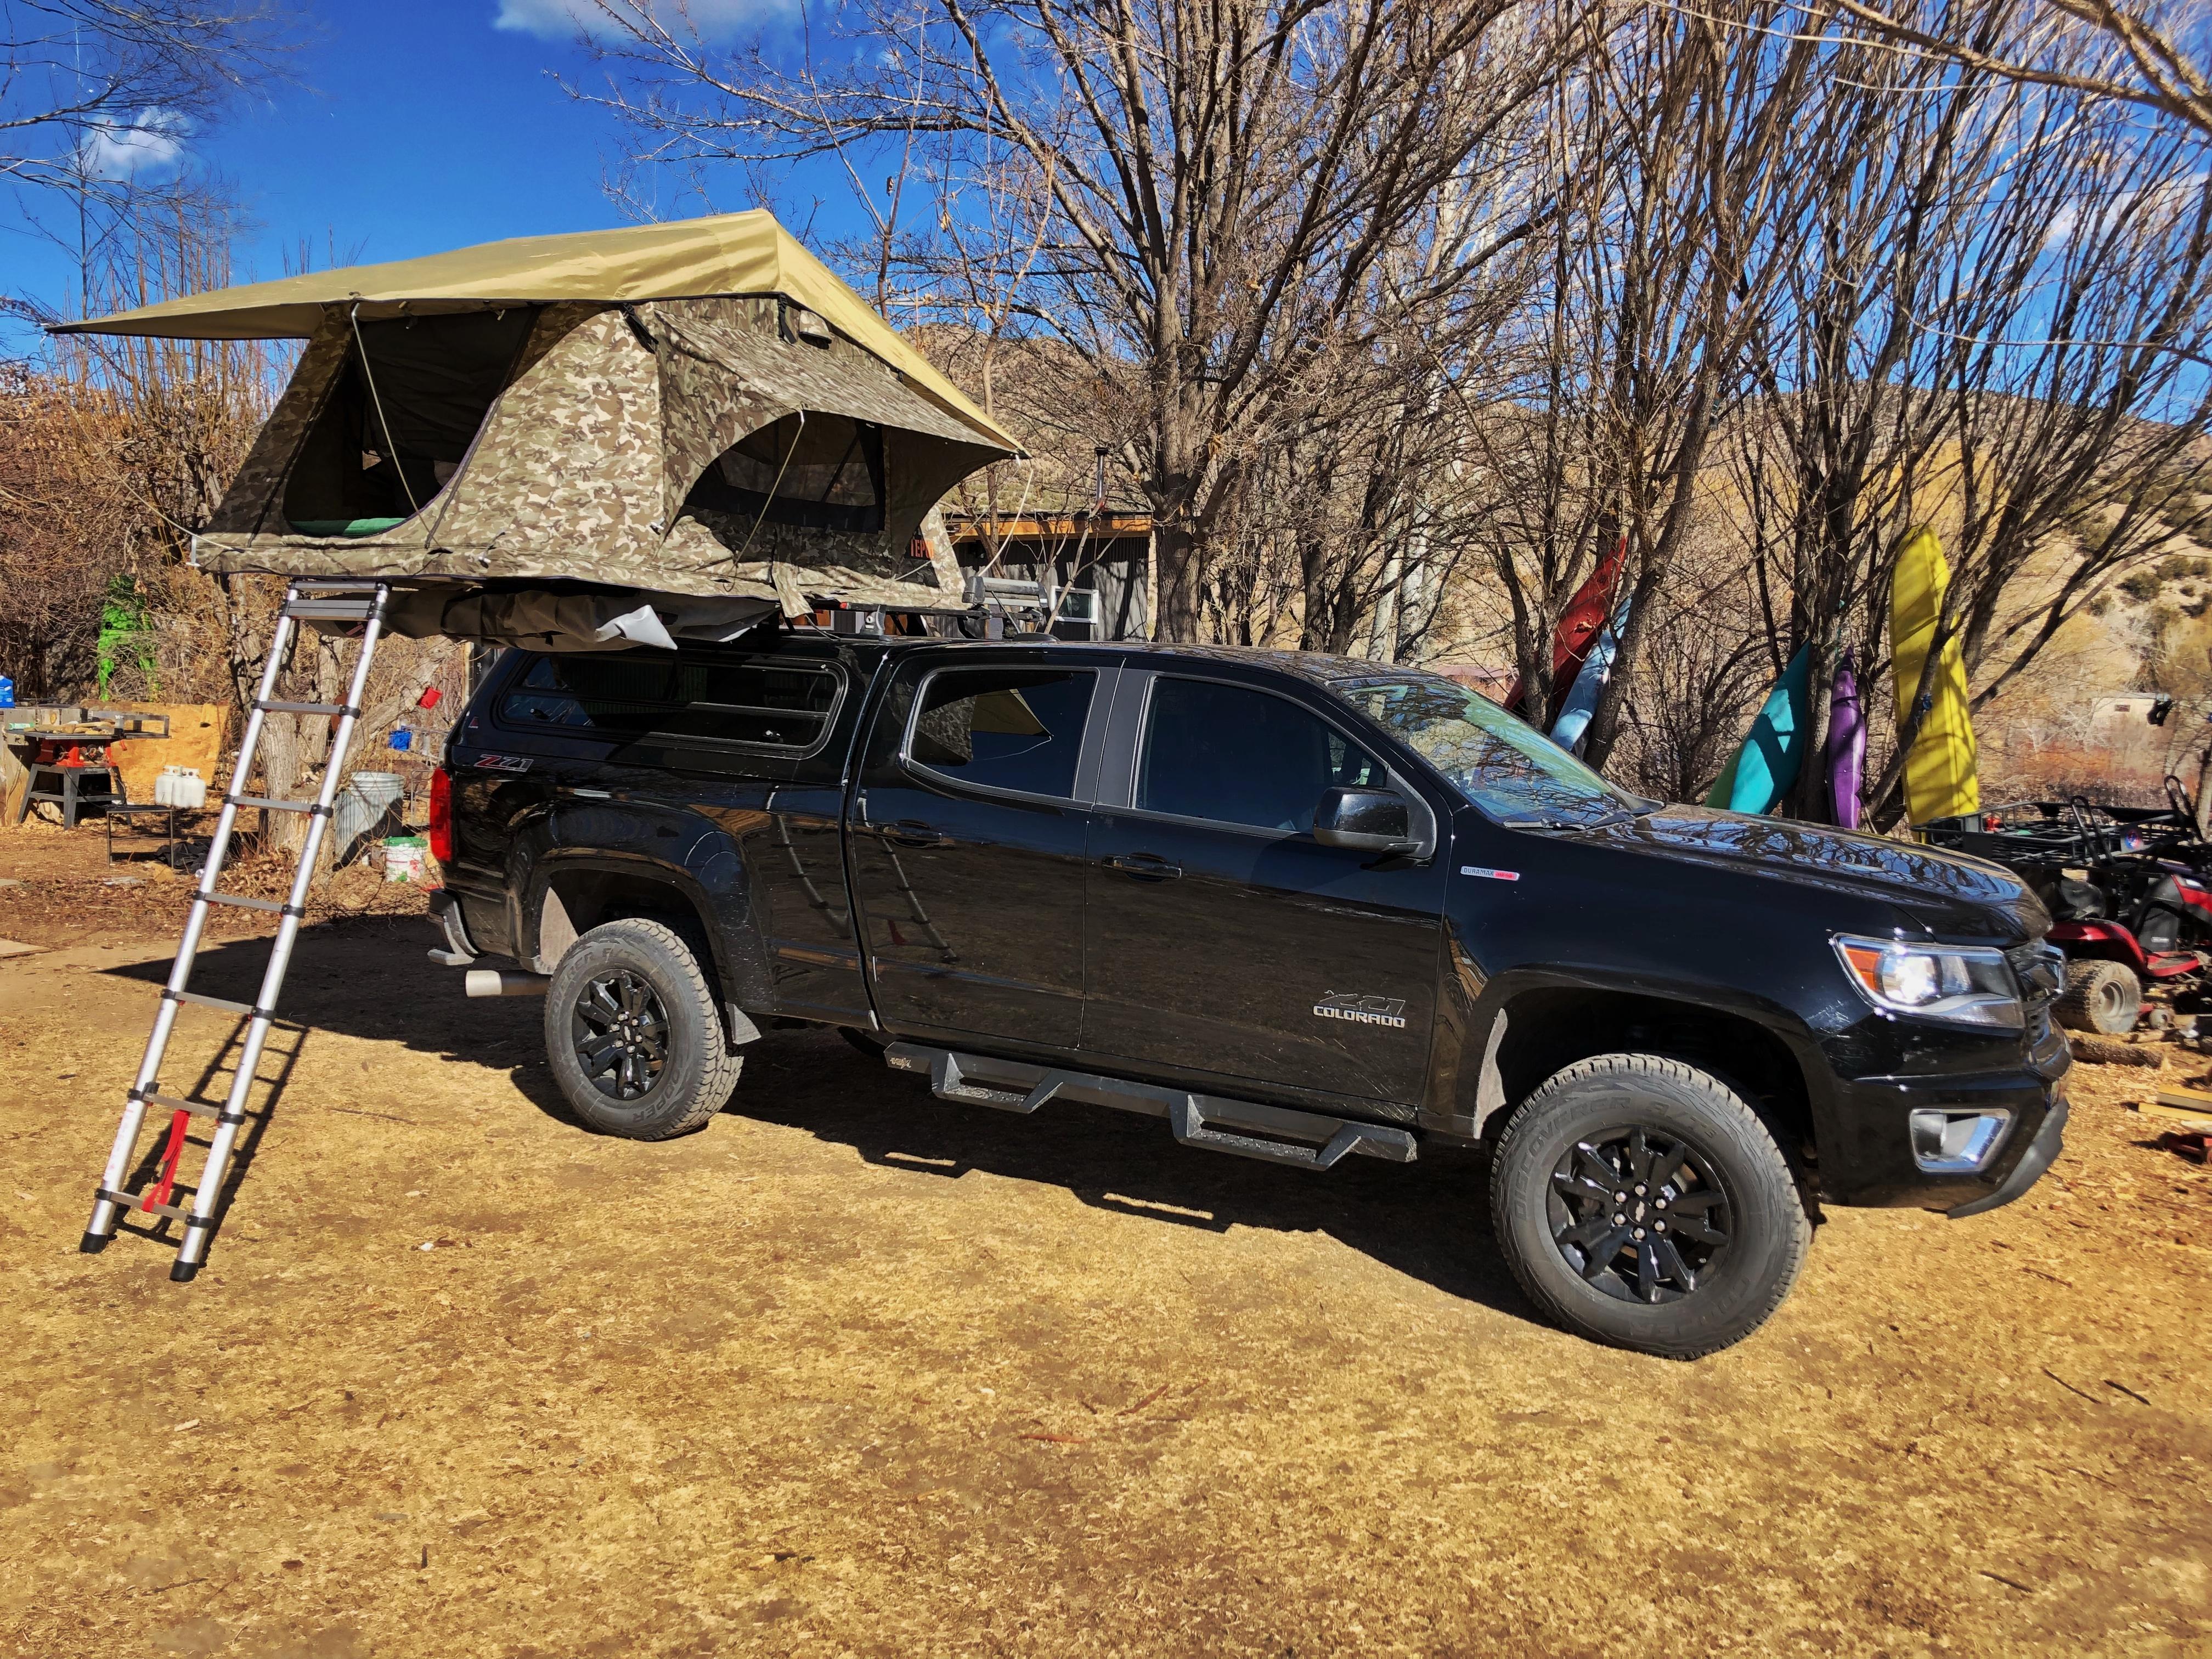 204C23C3-9434-4981-A0AA-D6F337CE8866.jpeg & Truck bed tent?!   Colorado Diesel Forum